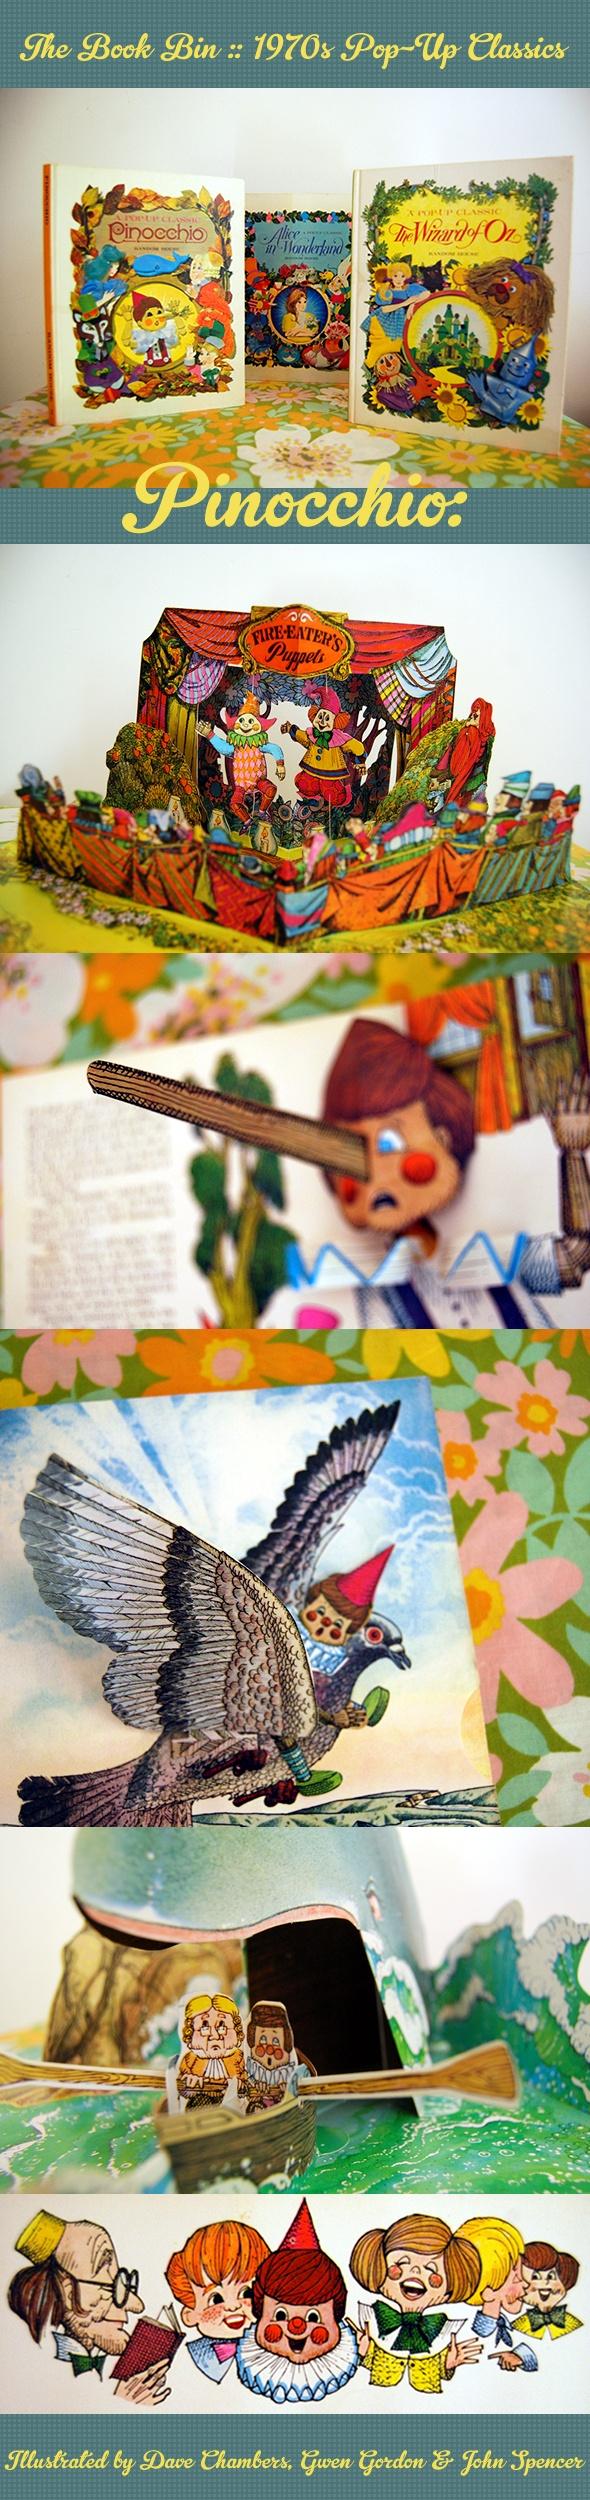 groovy 70s pop-up books :: Pinocchio